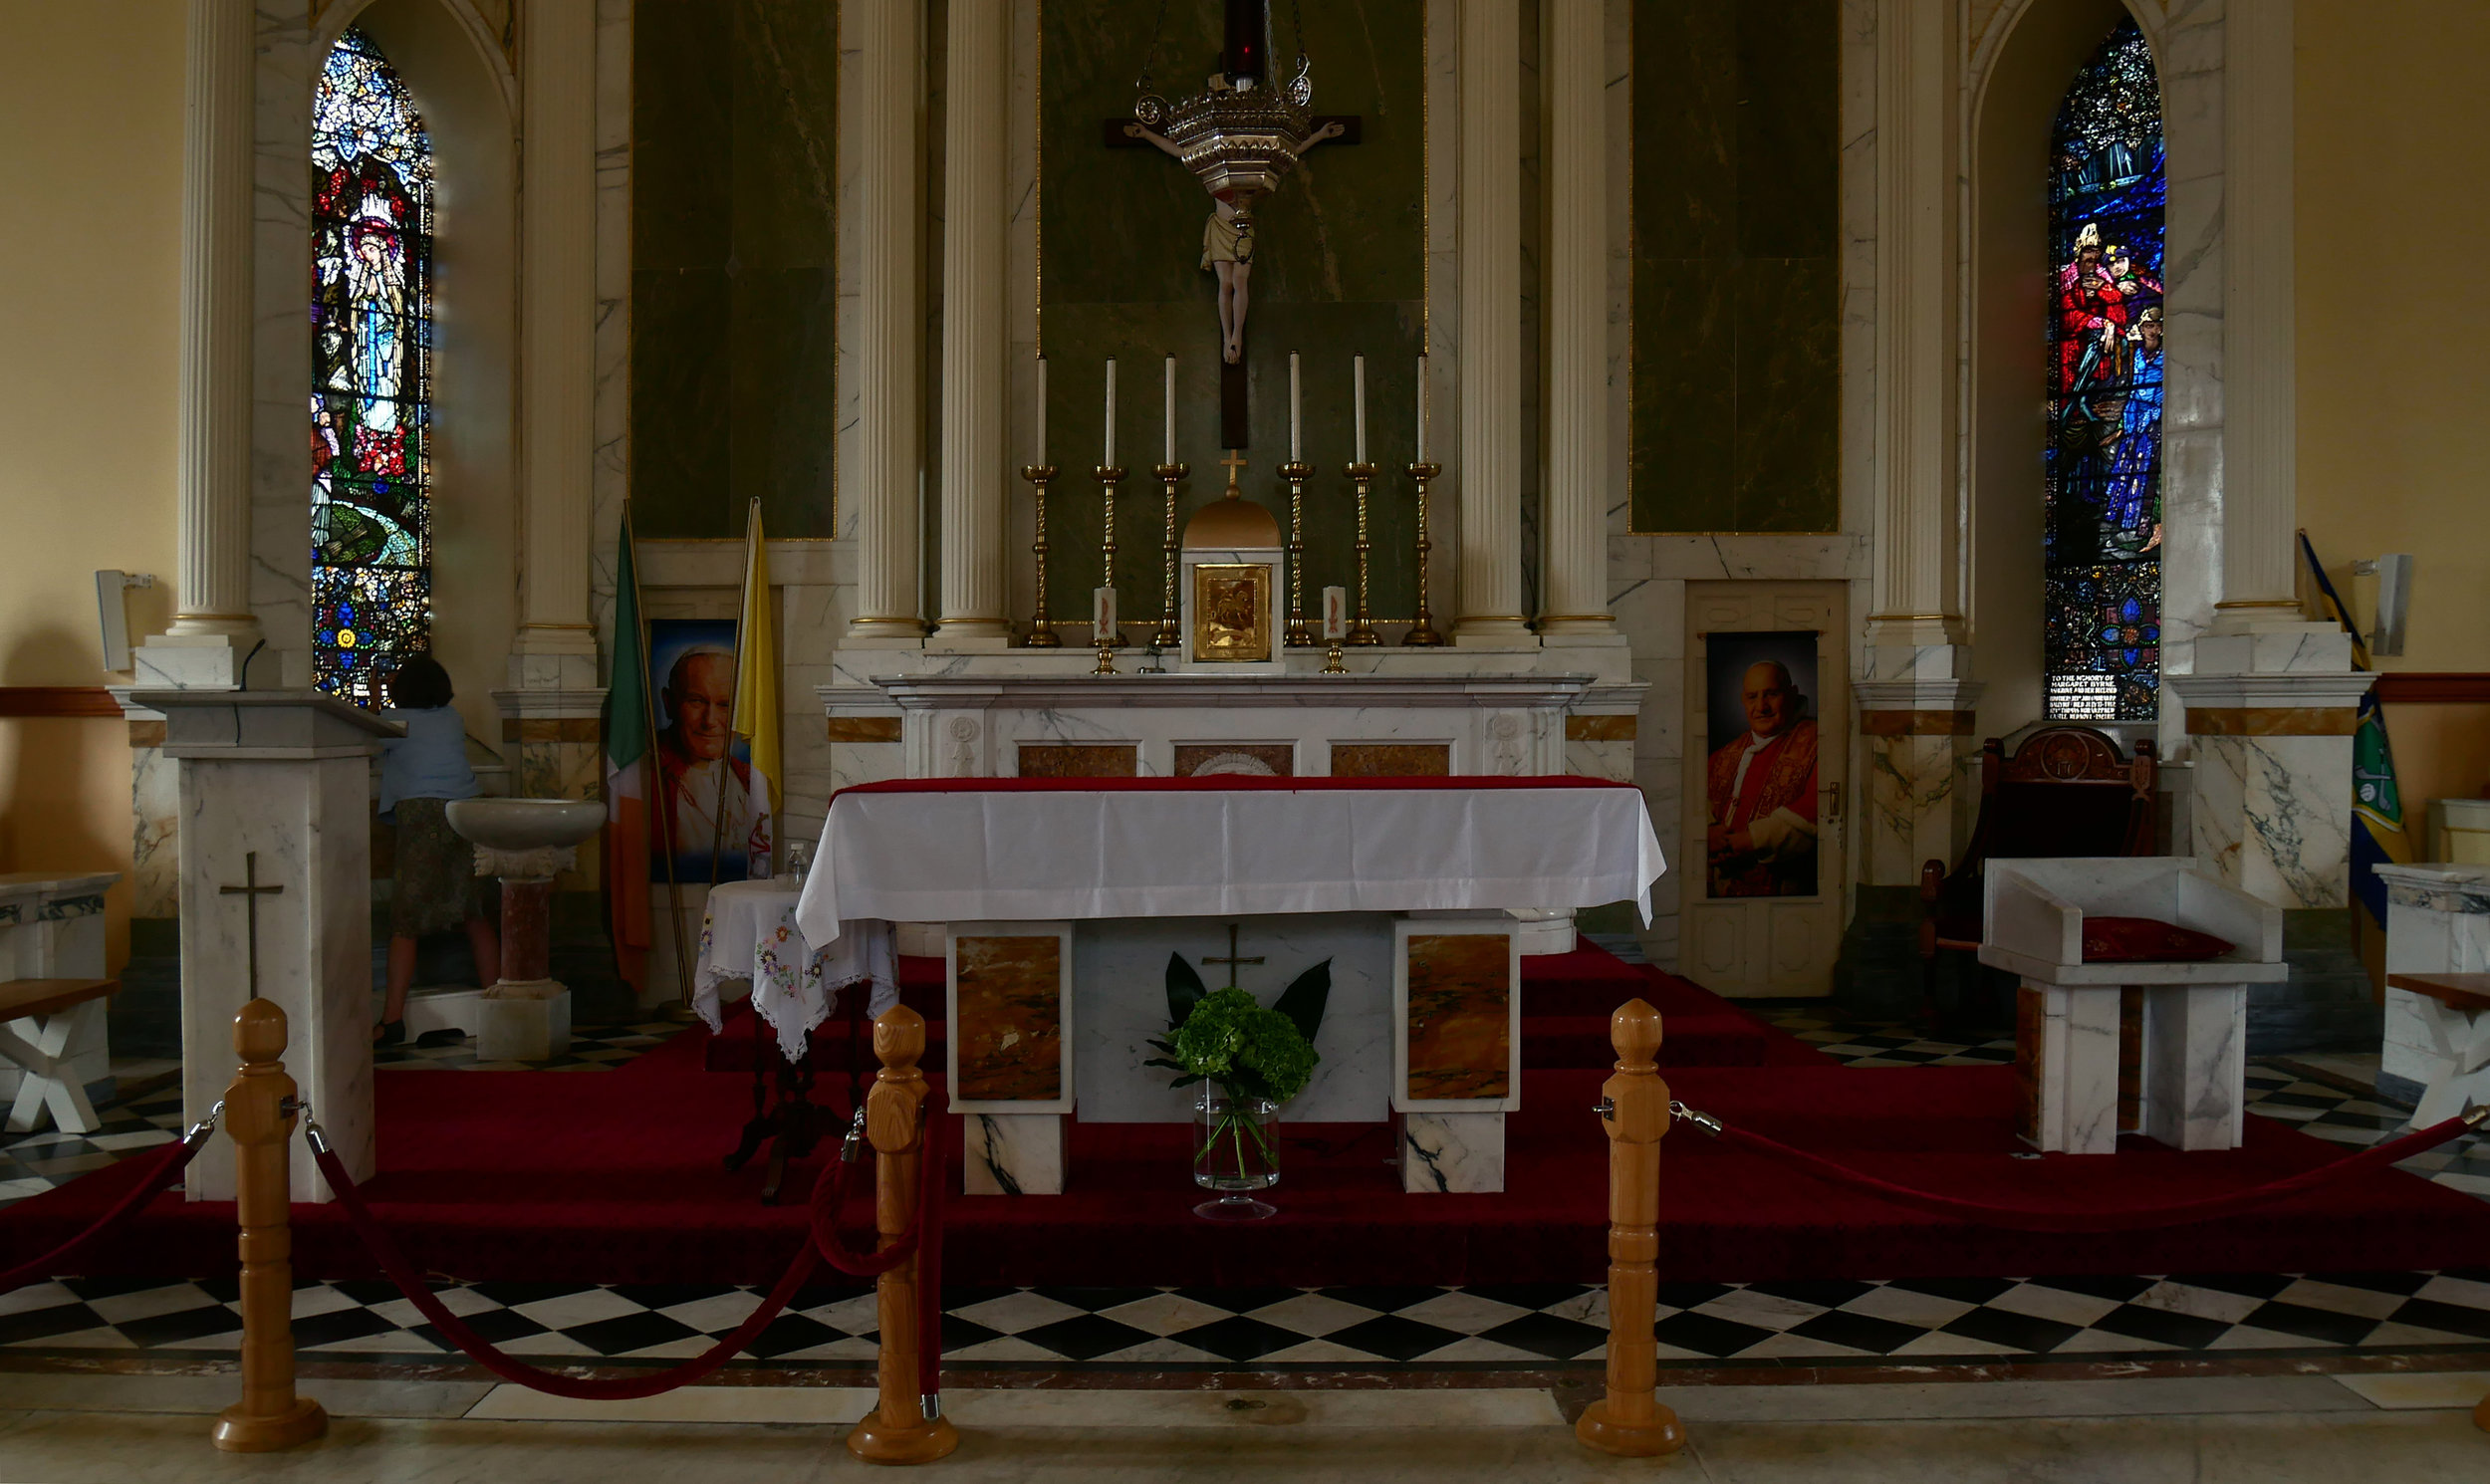 Interior of Duhill Catholic Church, County Tipperary